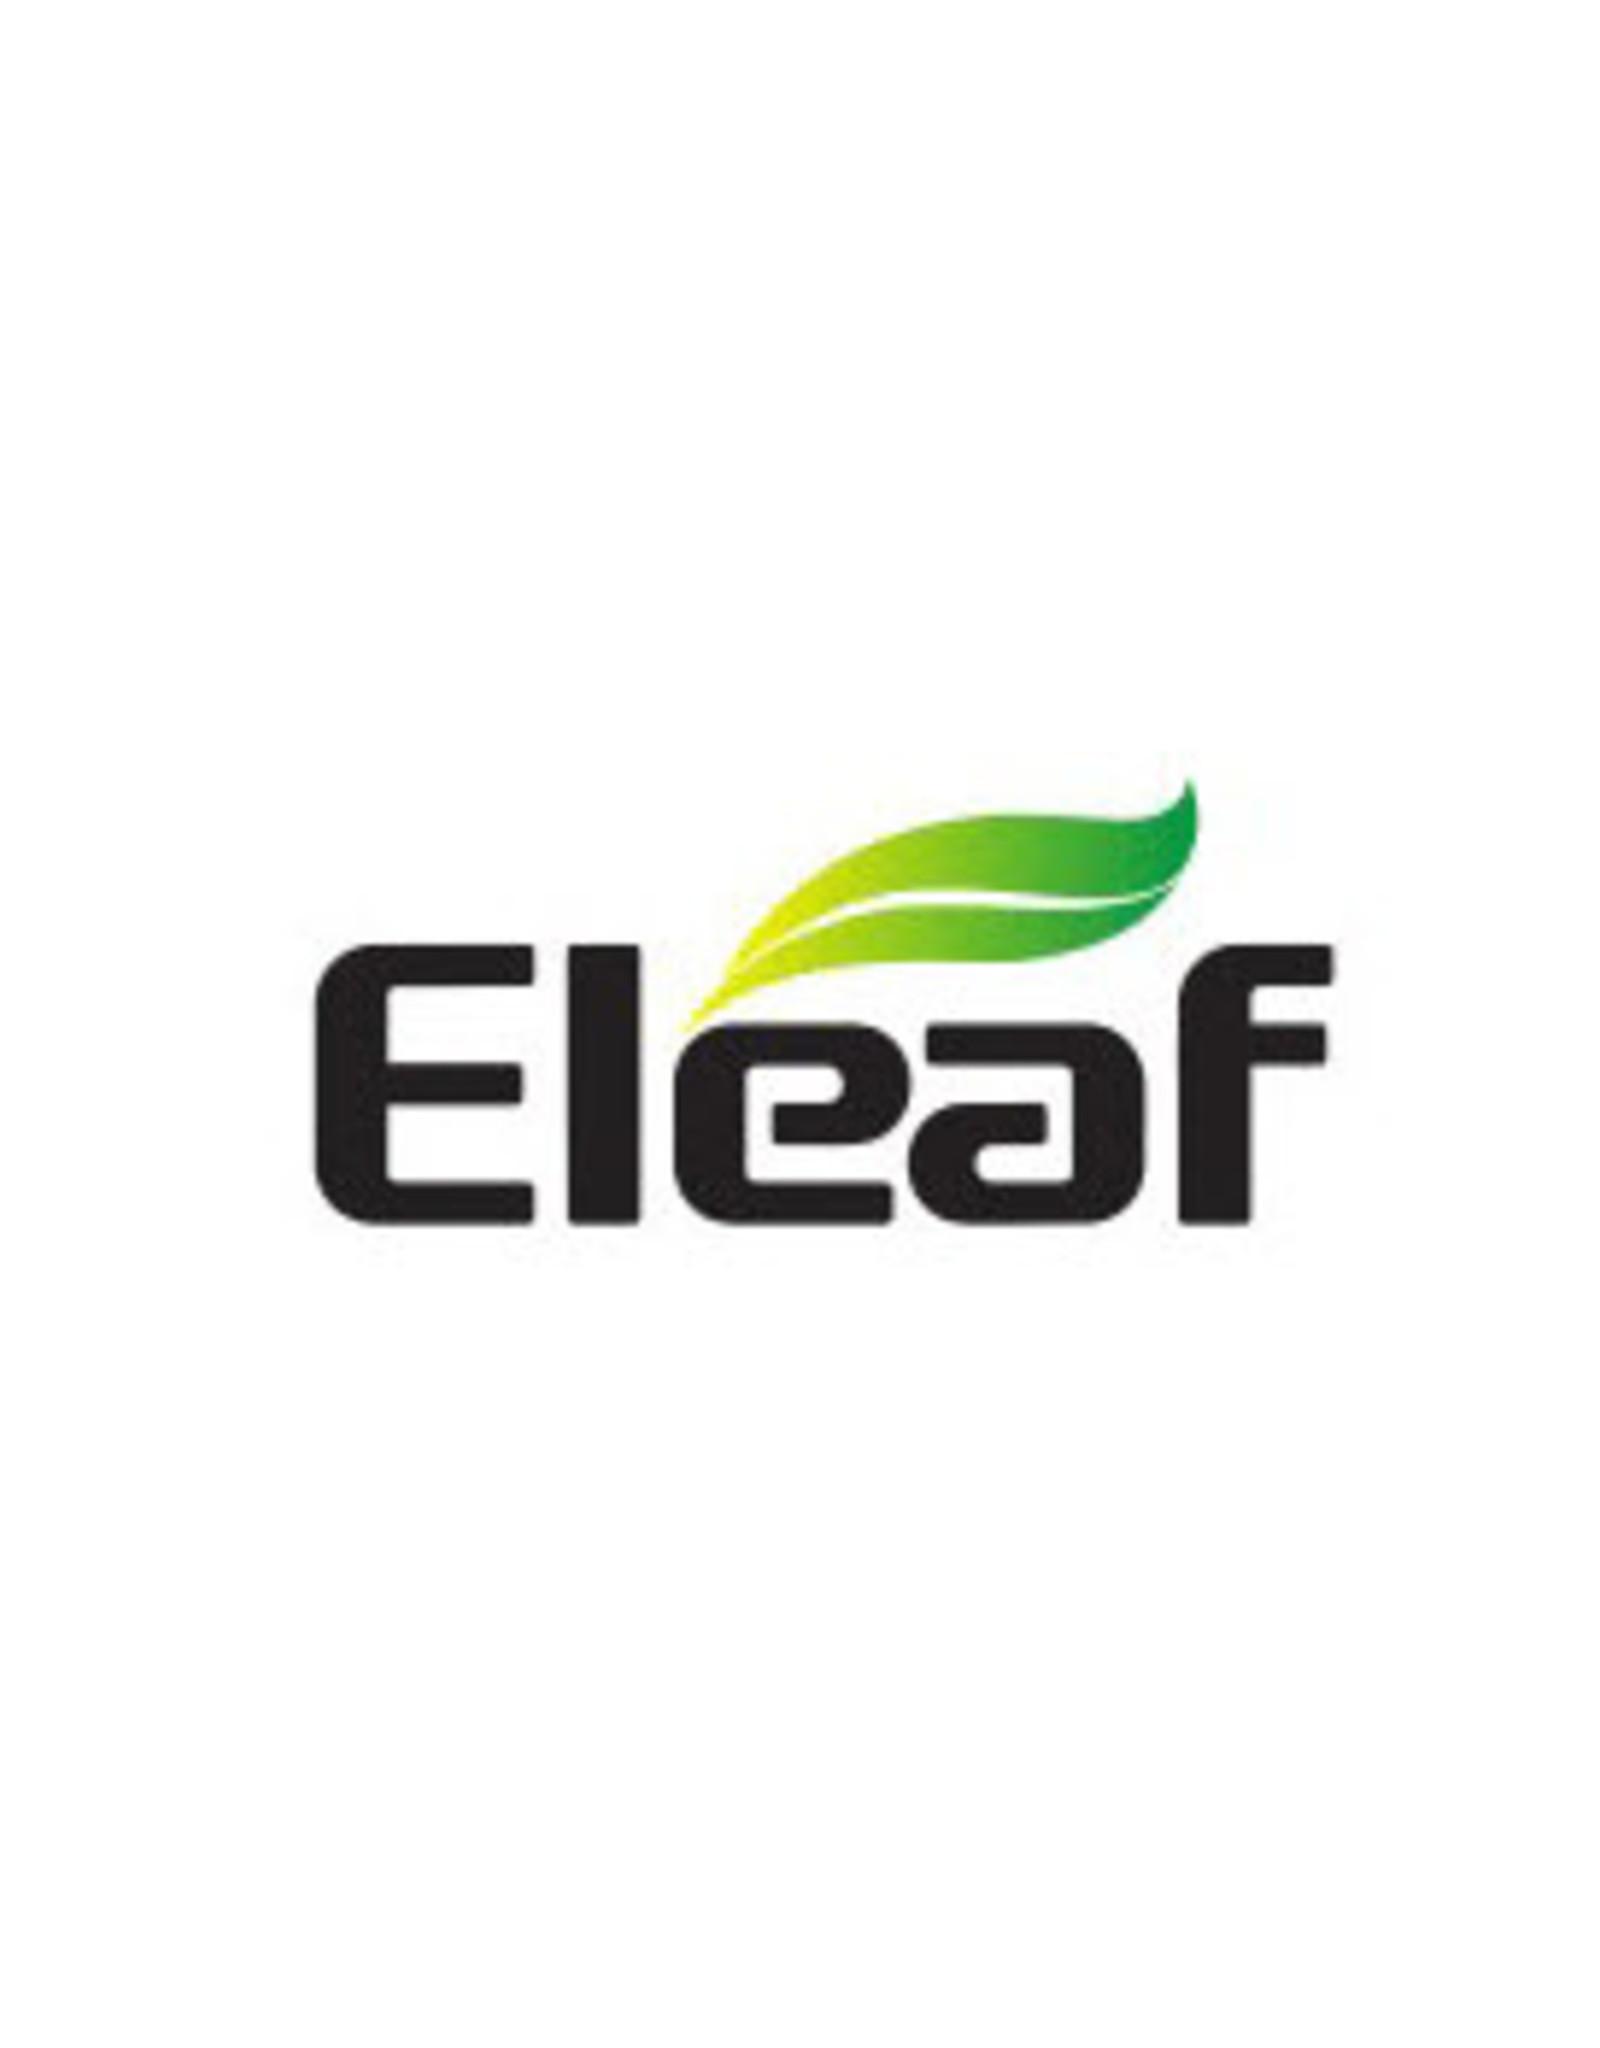 Eleaf ELEAF ELVEN REPLACEMENT CARTRIDGE (4 PACK)